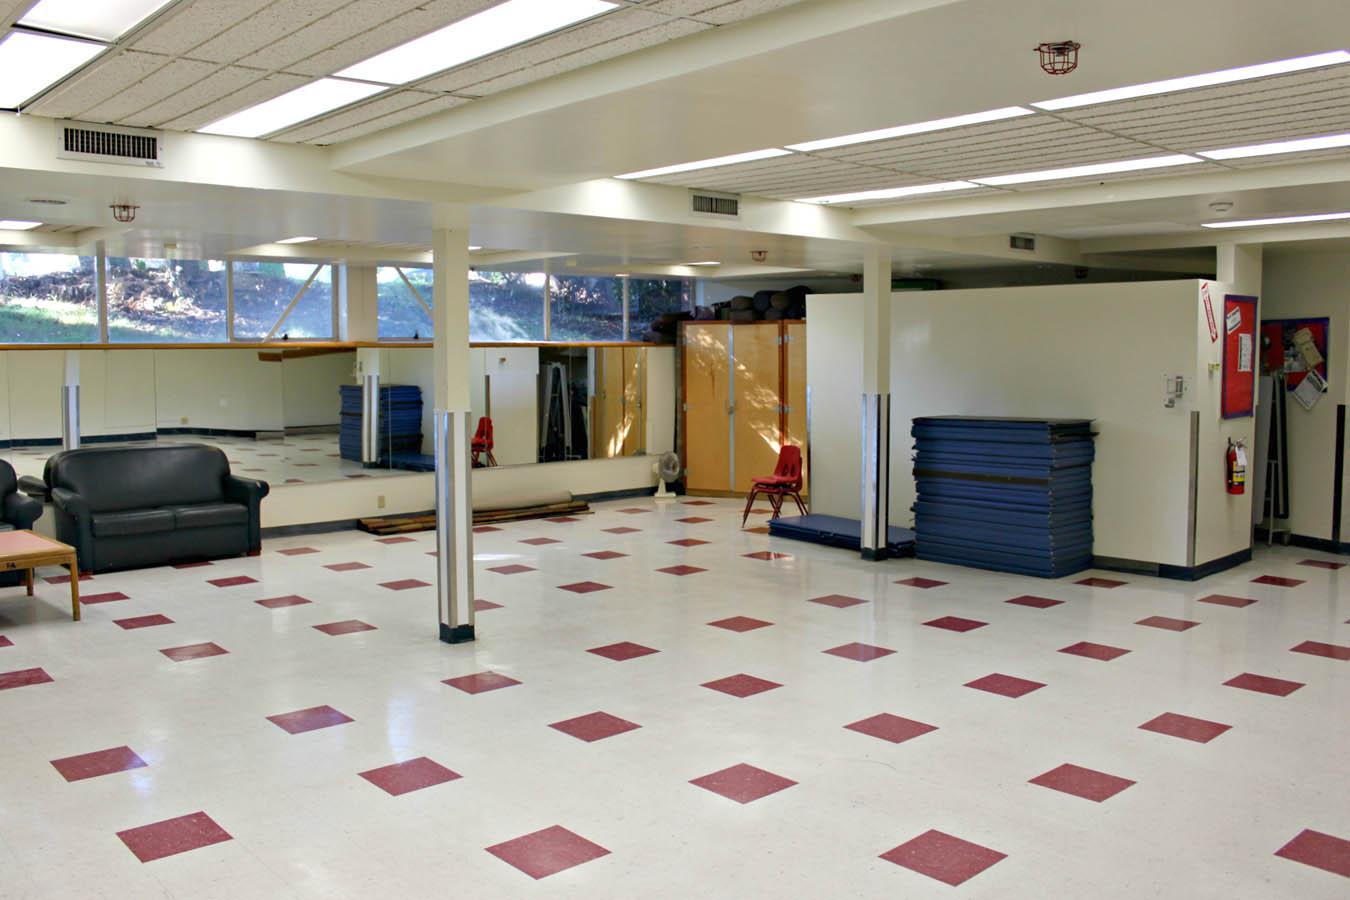 The Multipurpose Room